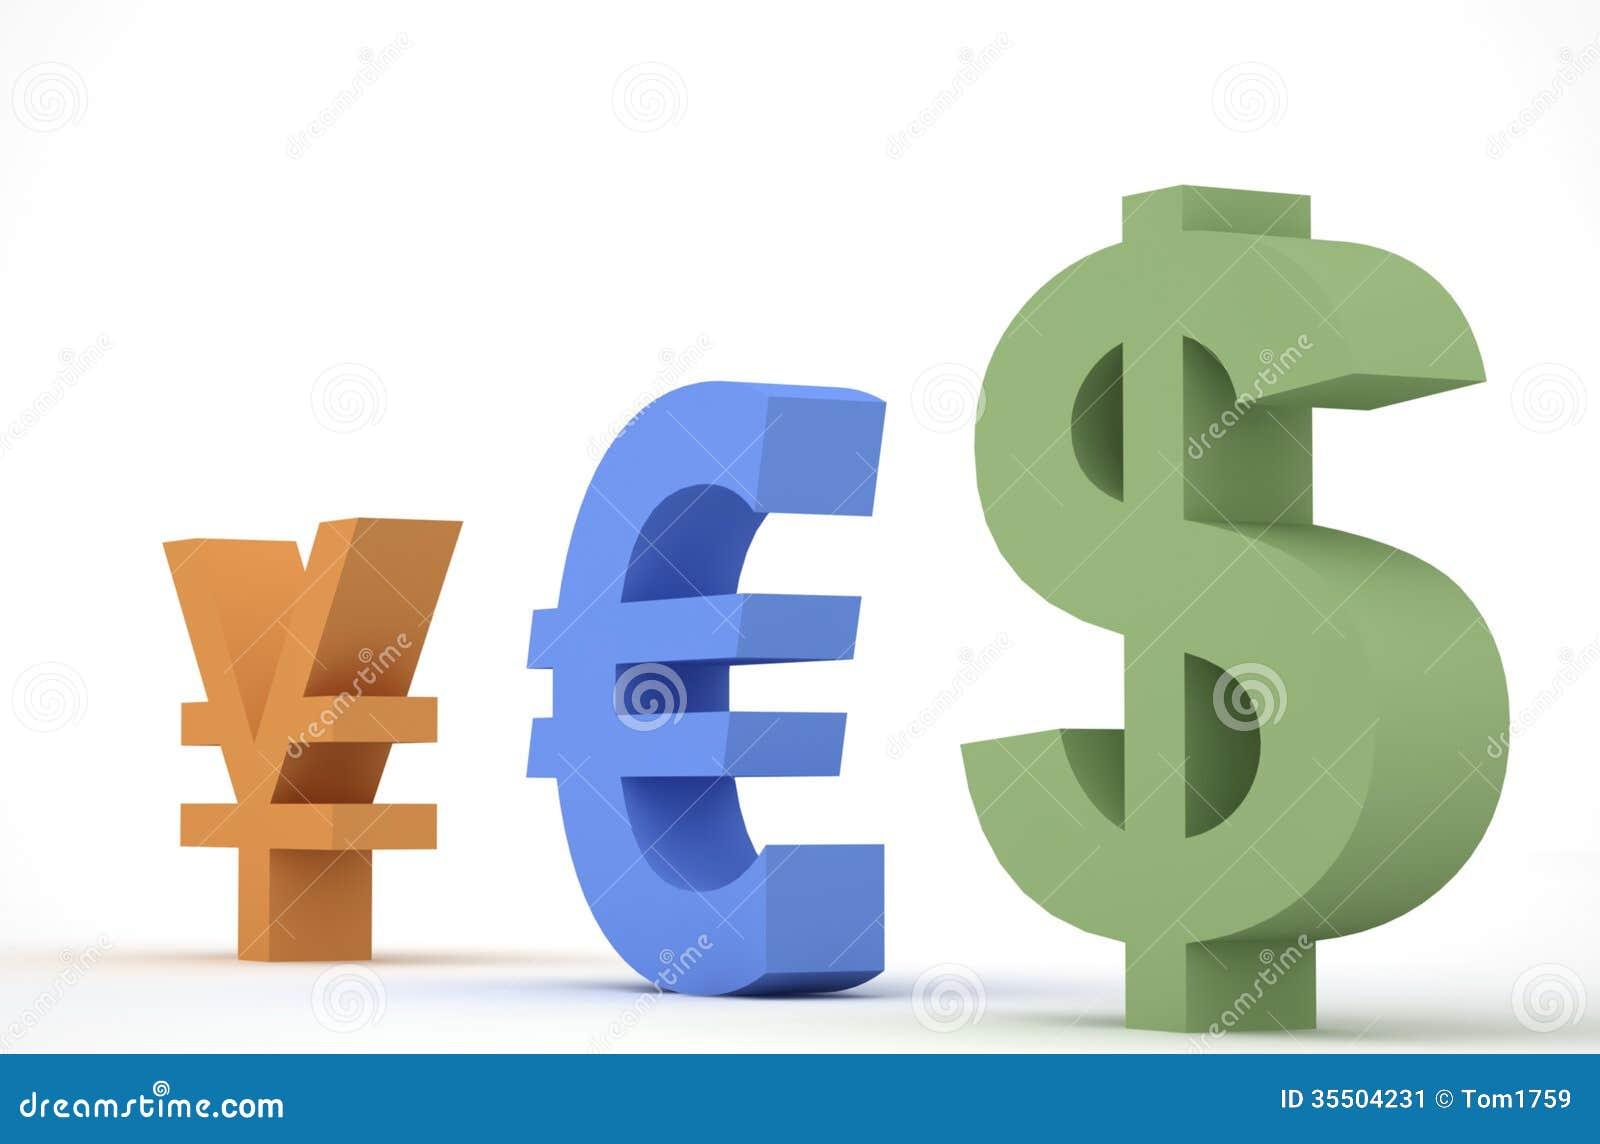 Rmb euro and dollar stock illustration illustration of rmb euro and dollar biocorpaavc Gallery